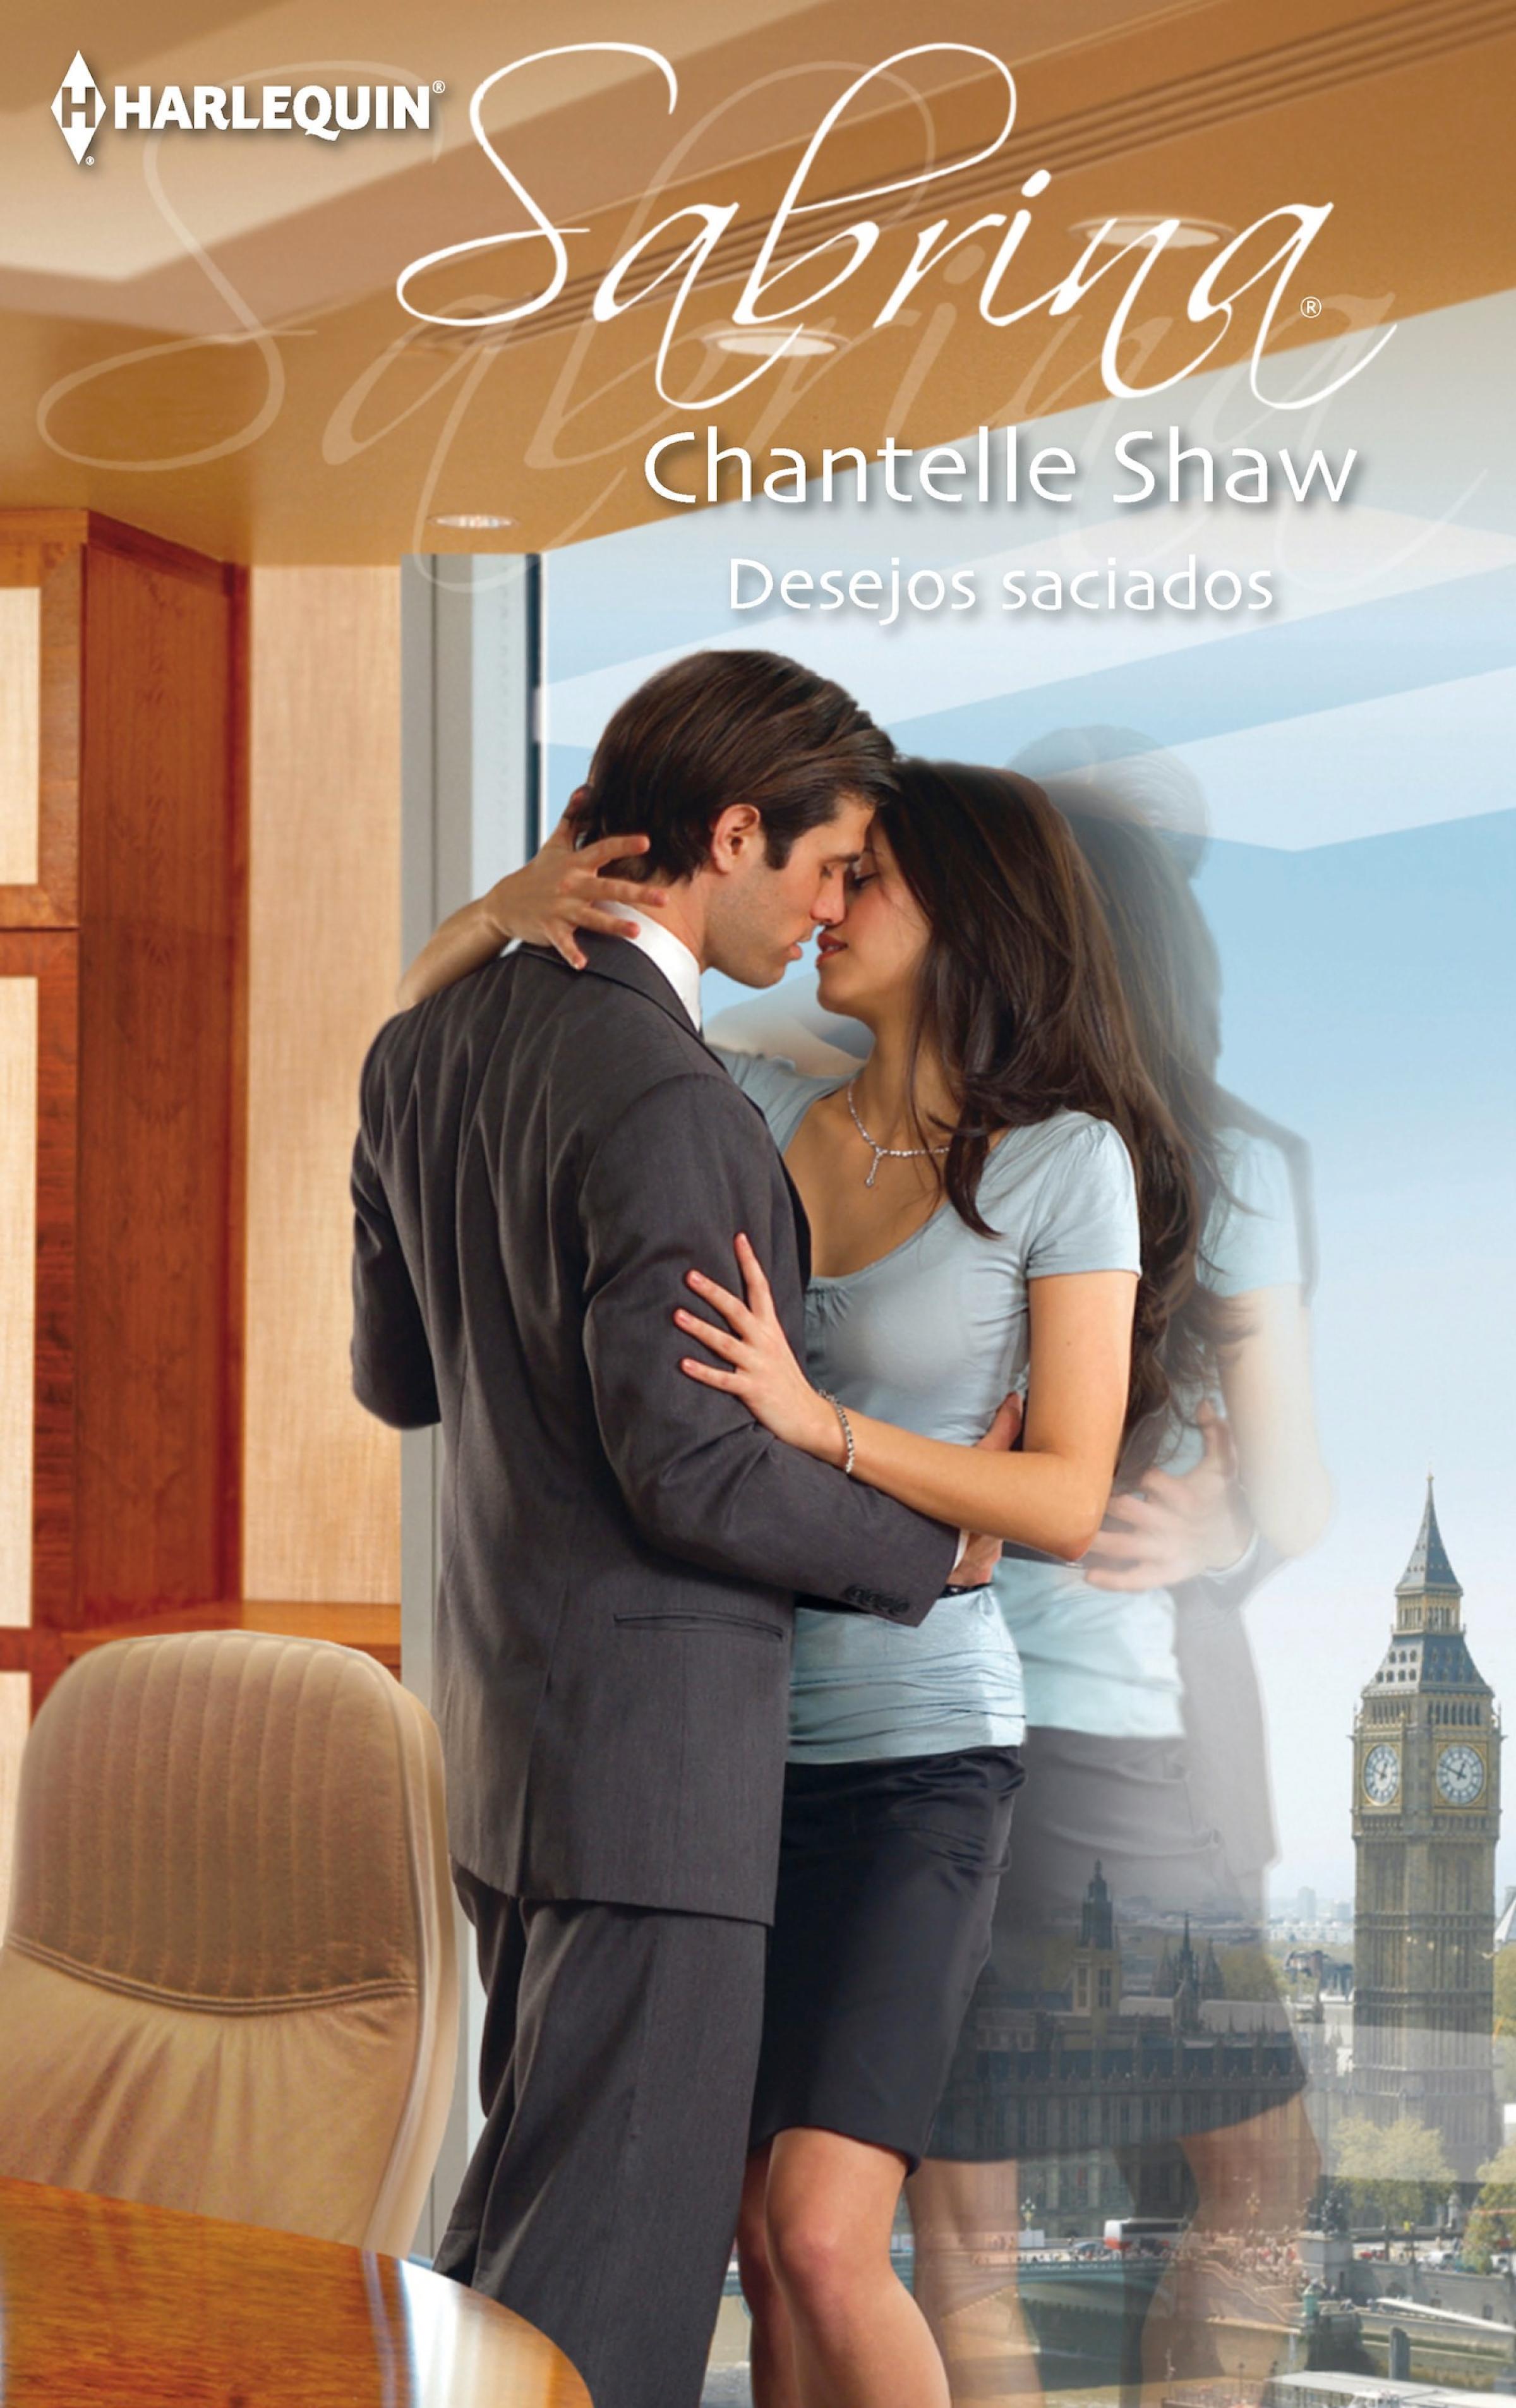 Chantelle Shaw Desejos saciados chantelle shaw untouched until marriage